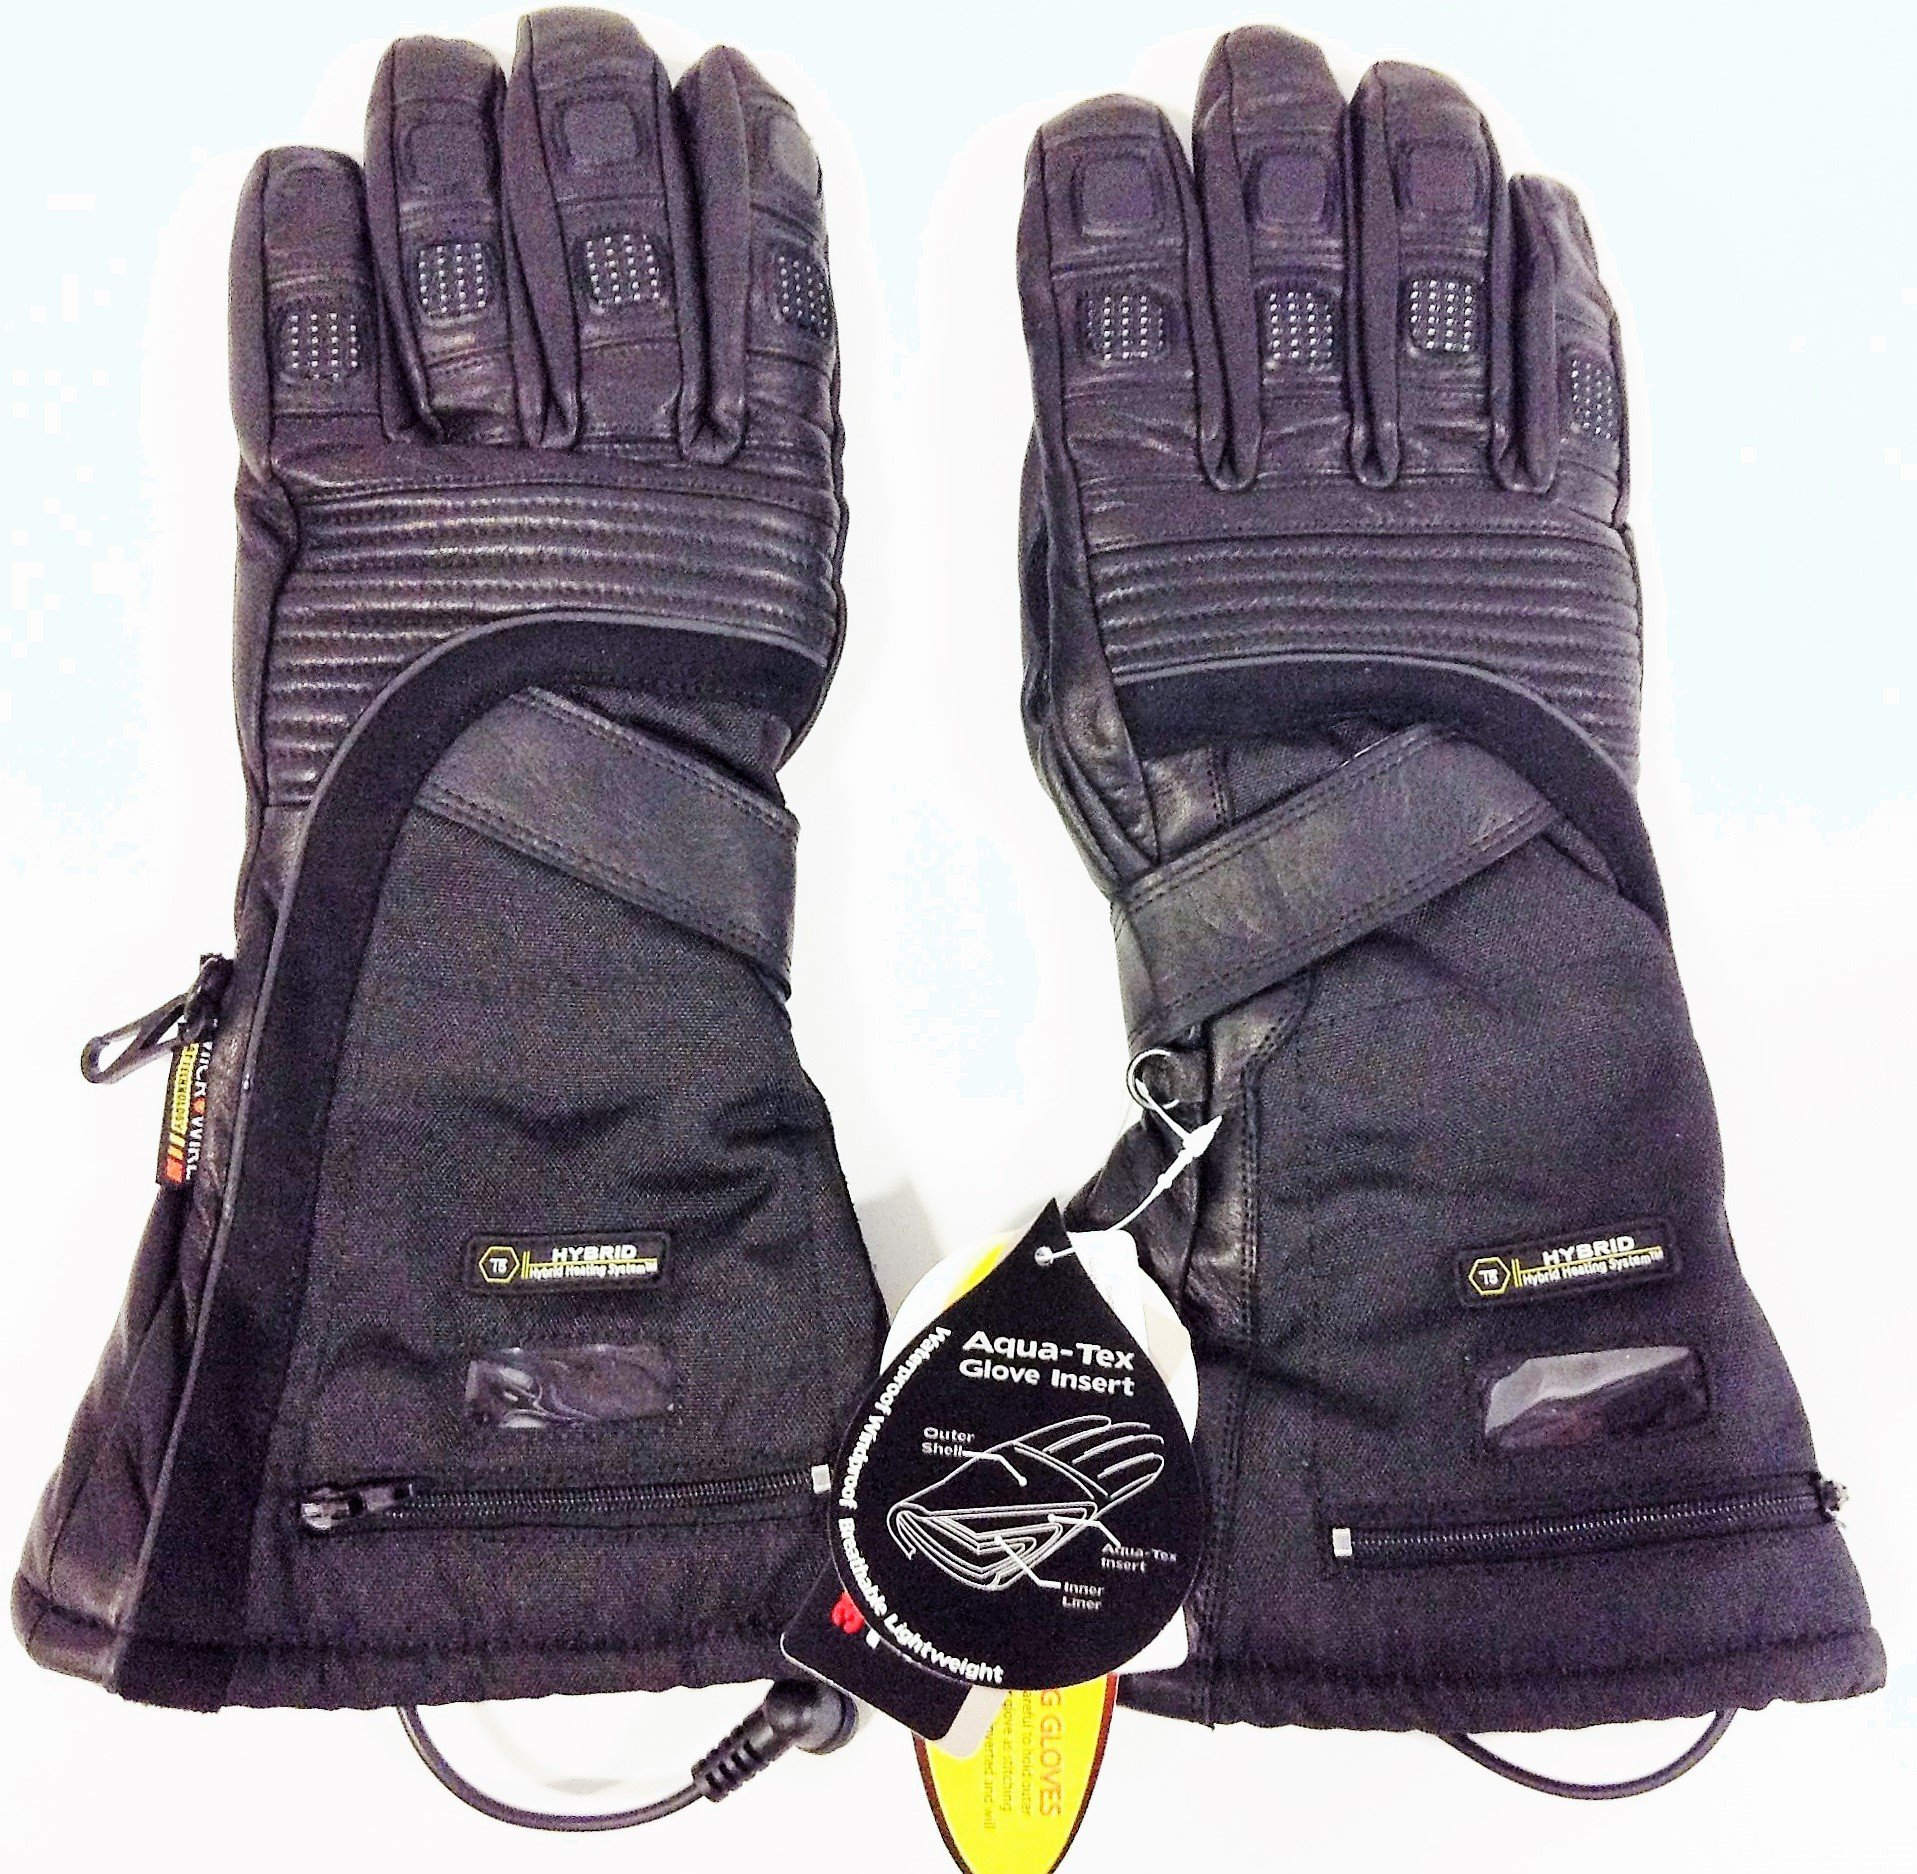 Gerbing's 12v T5 Hybrid Gloves-Men's-Motorcycle-Small